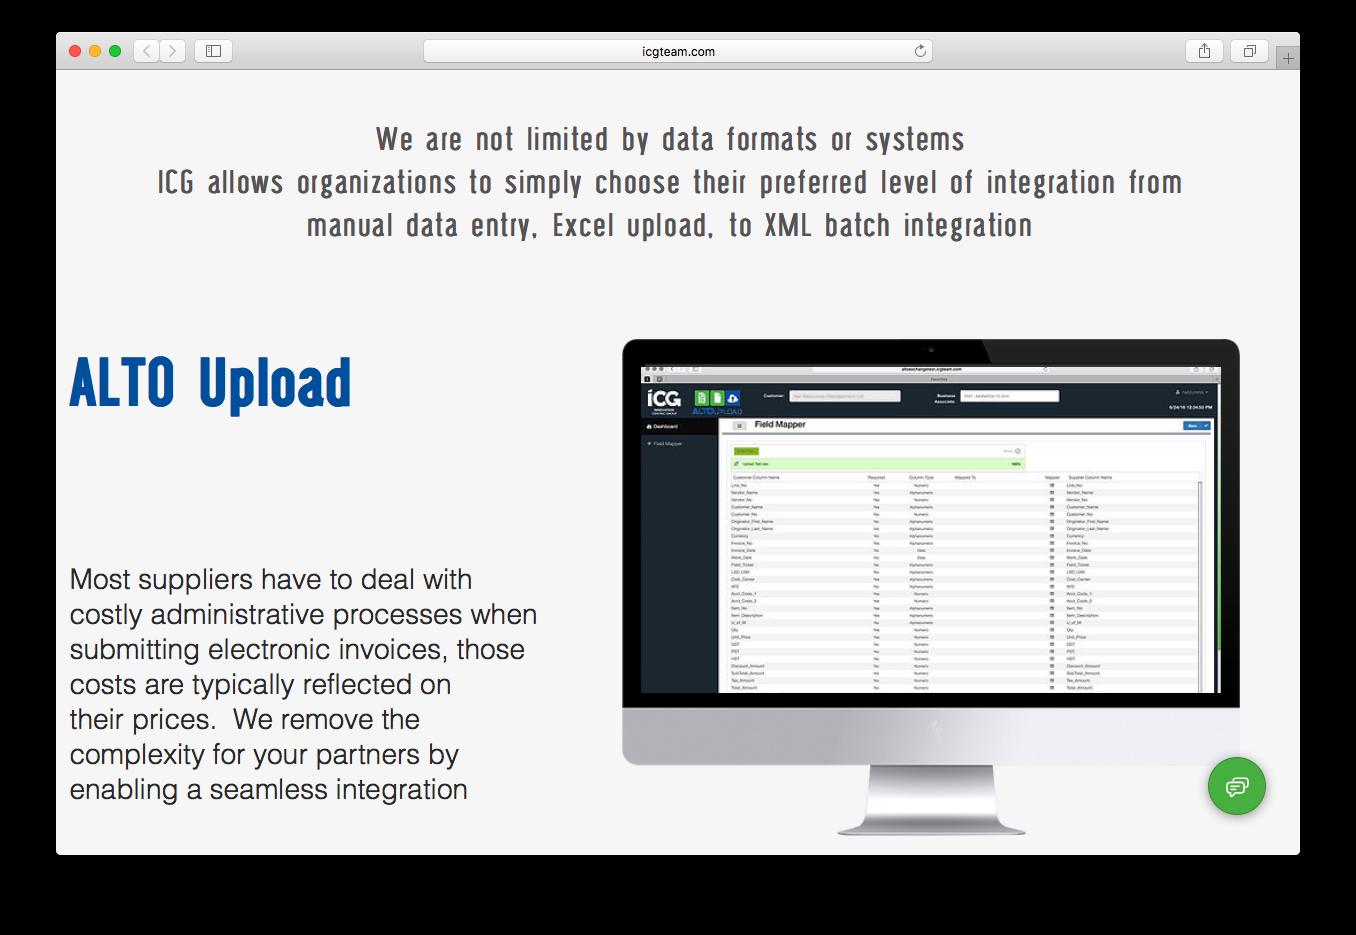 ALTO exchange upload integration electronic invoices